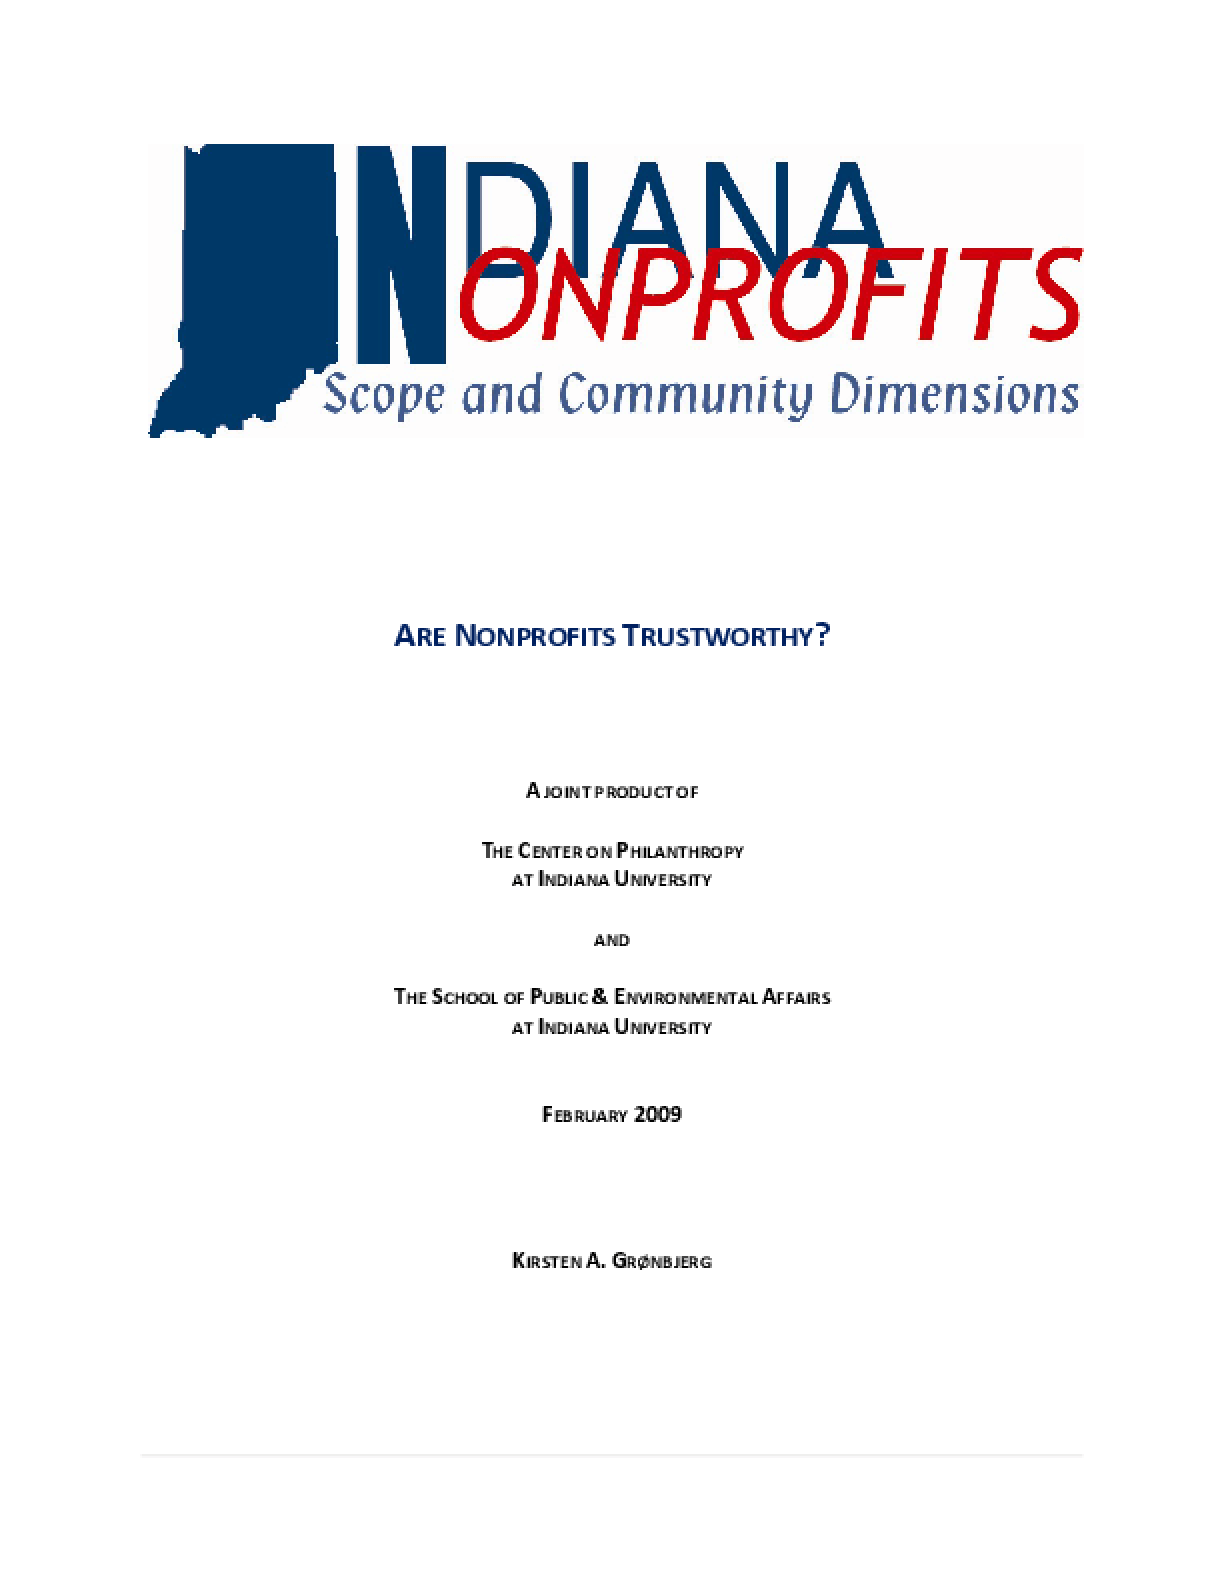 Are Nonprofits Trustworthy?